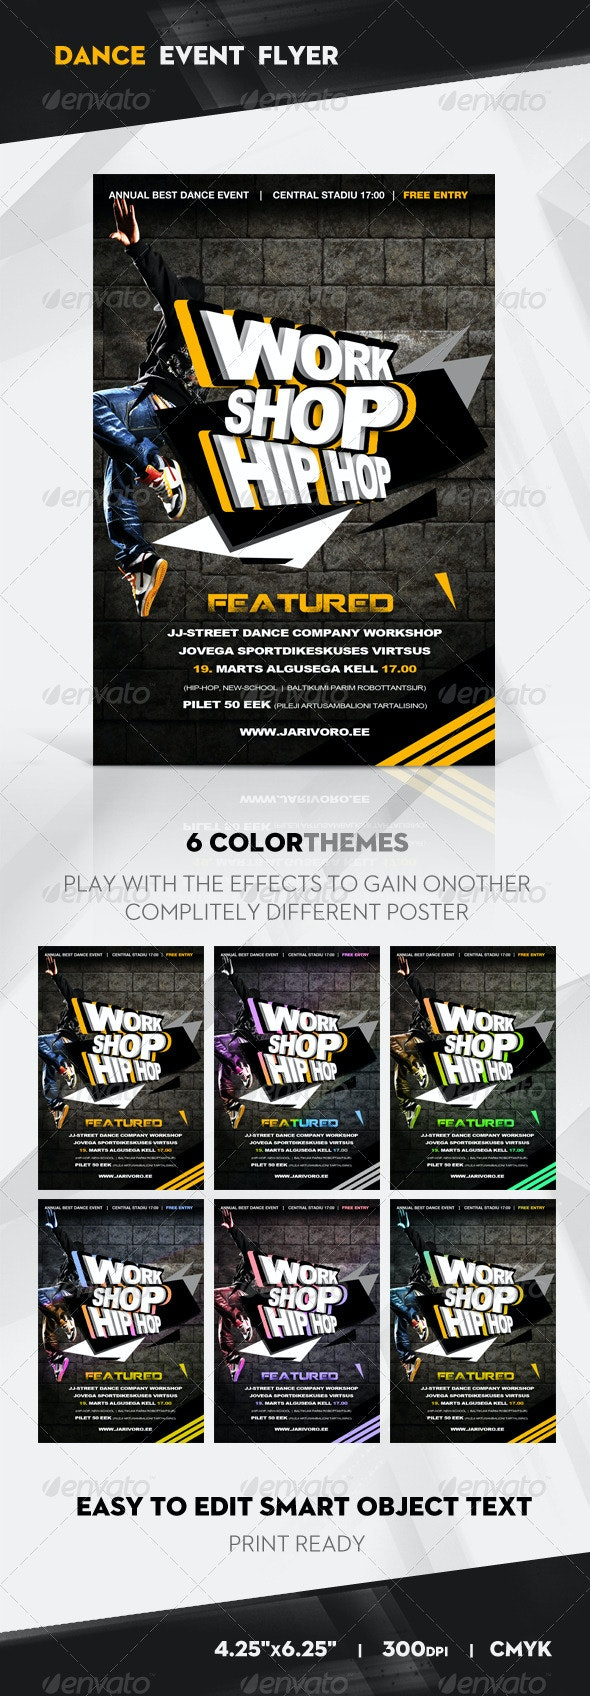 Work Shop Hip Hop Flyer / Poster - Clubs & Parties Events